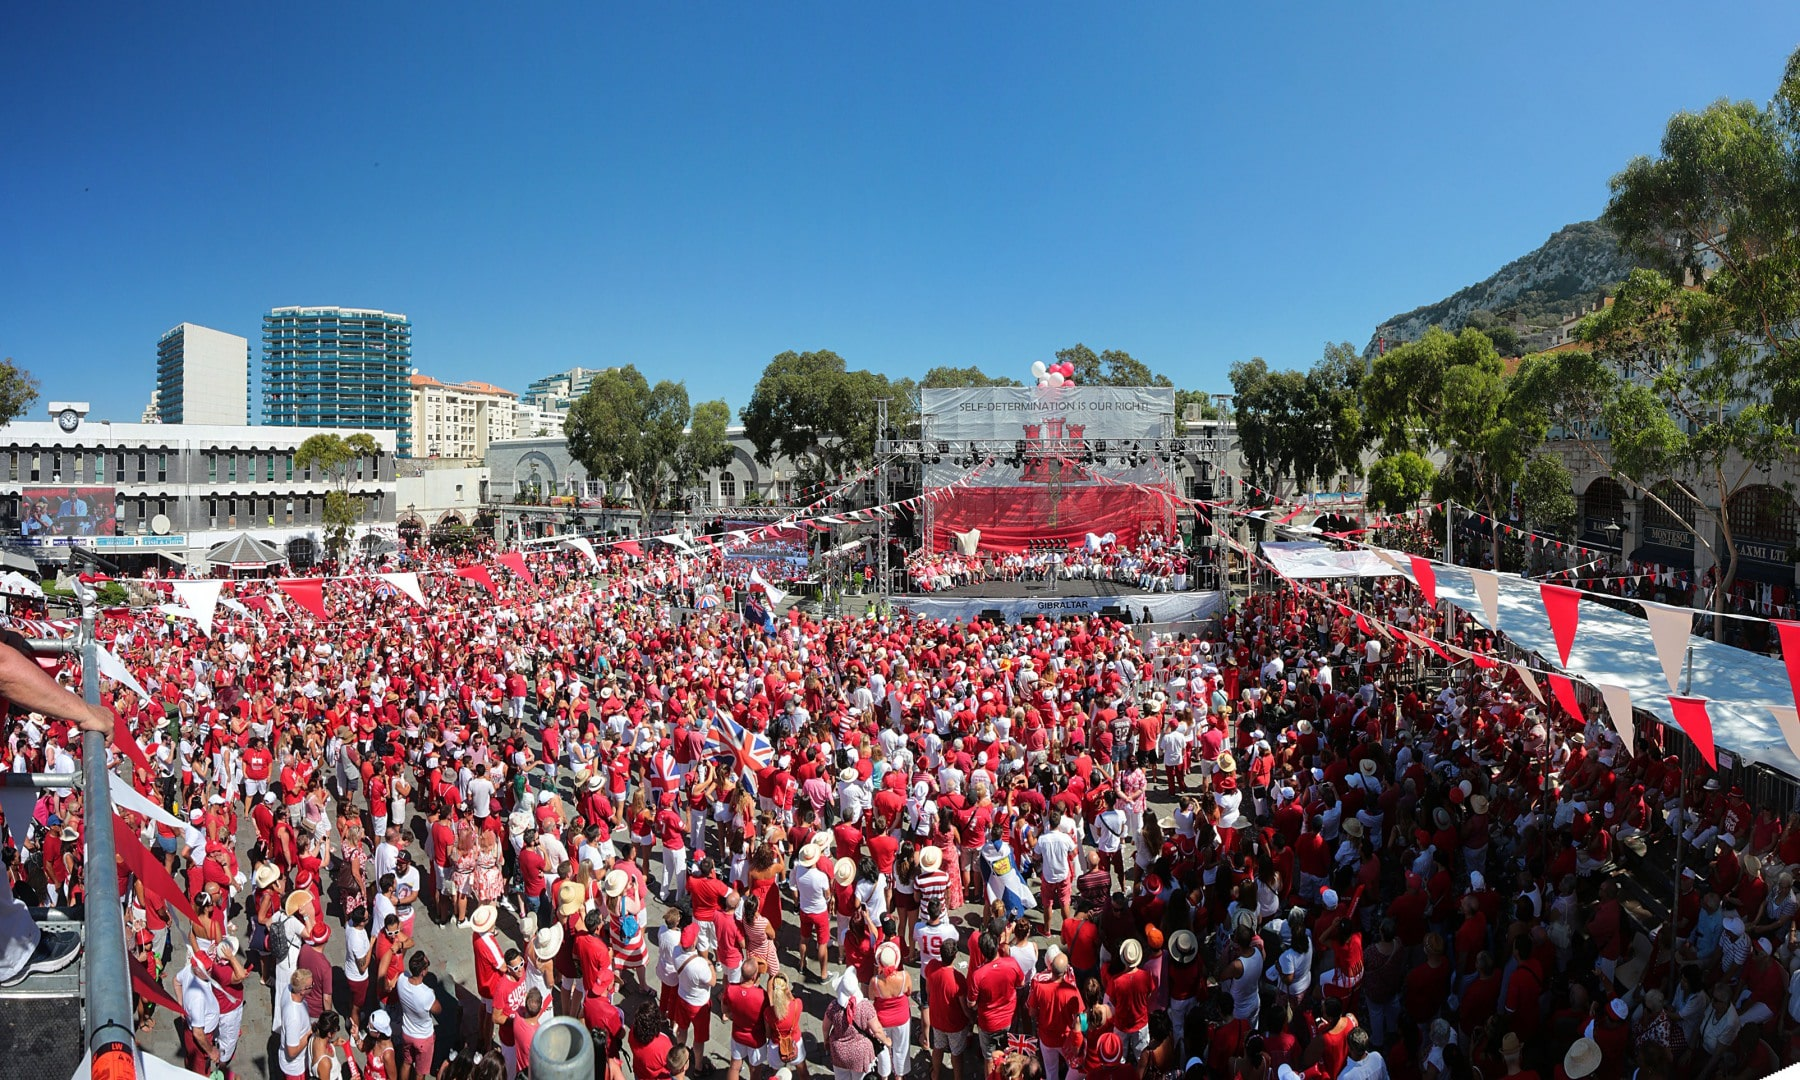 160910-national-day-gibraltar-2016-88_29570774006_o